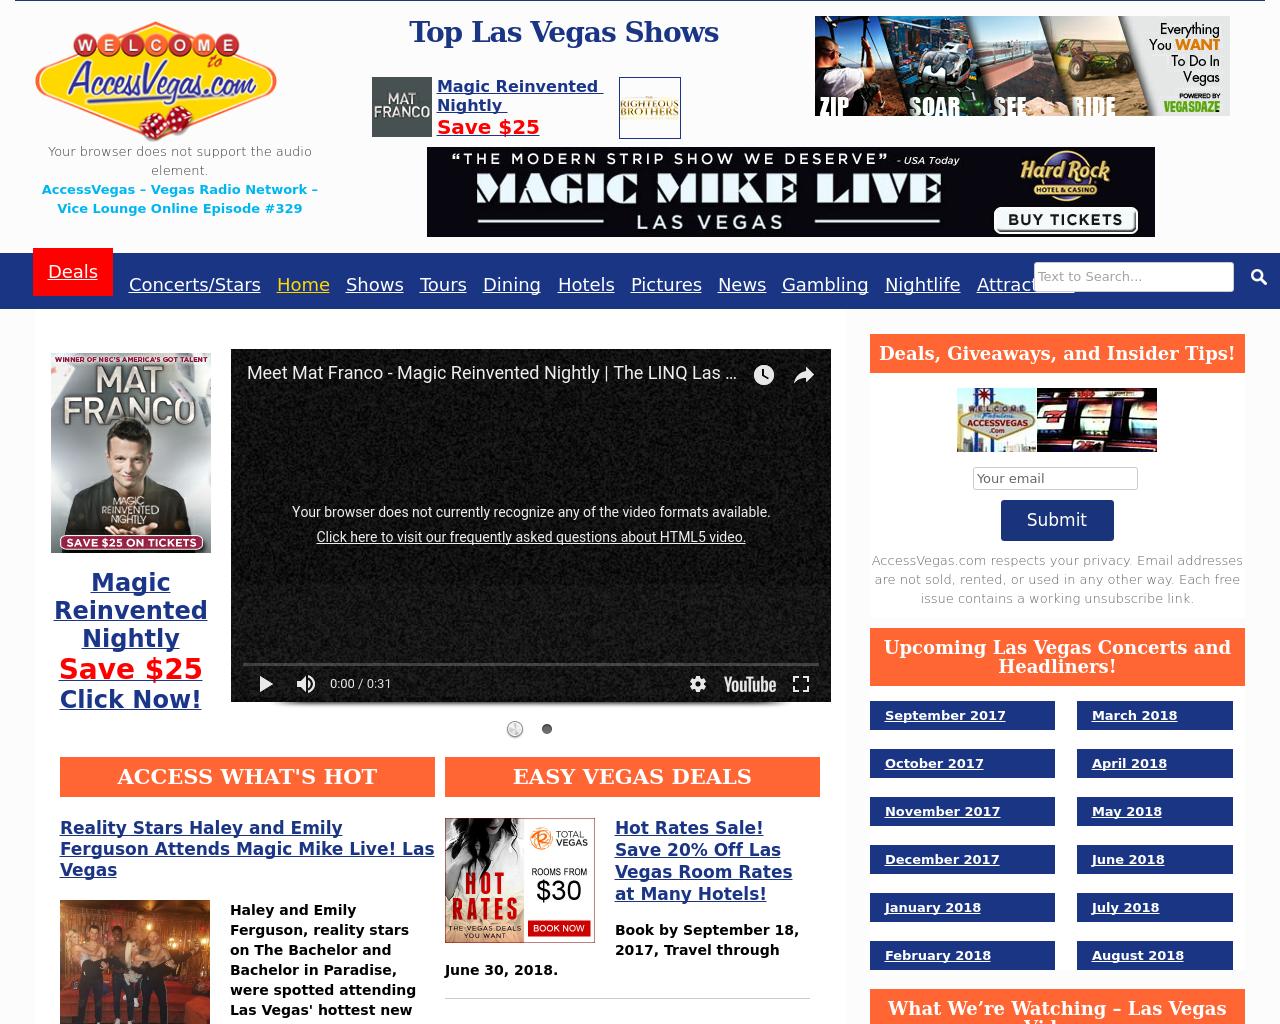 AccessVegas.com-Advertising-Reviews-Pricing